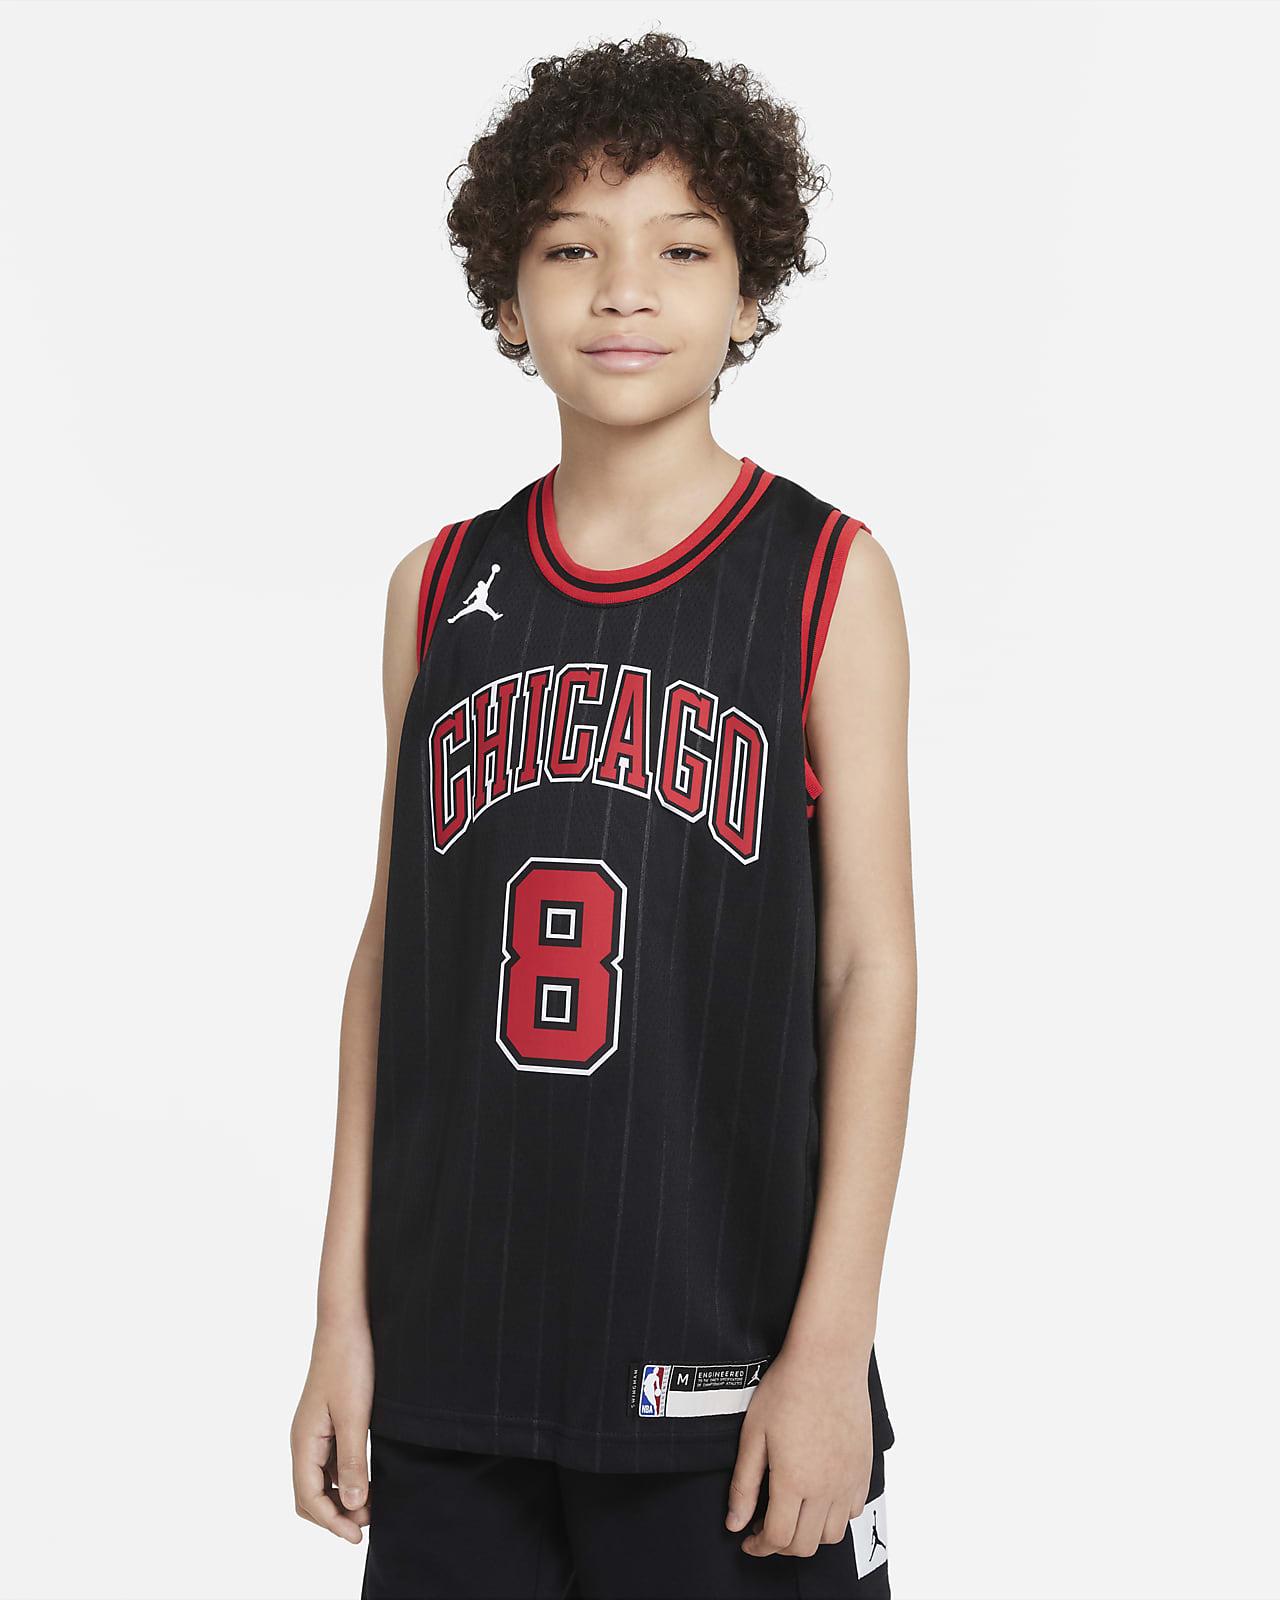 Koszulka dla dużych dzieci Zach LaVine Bulls Statement Edition Jordan NBA Swingman